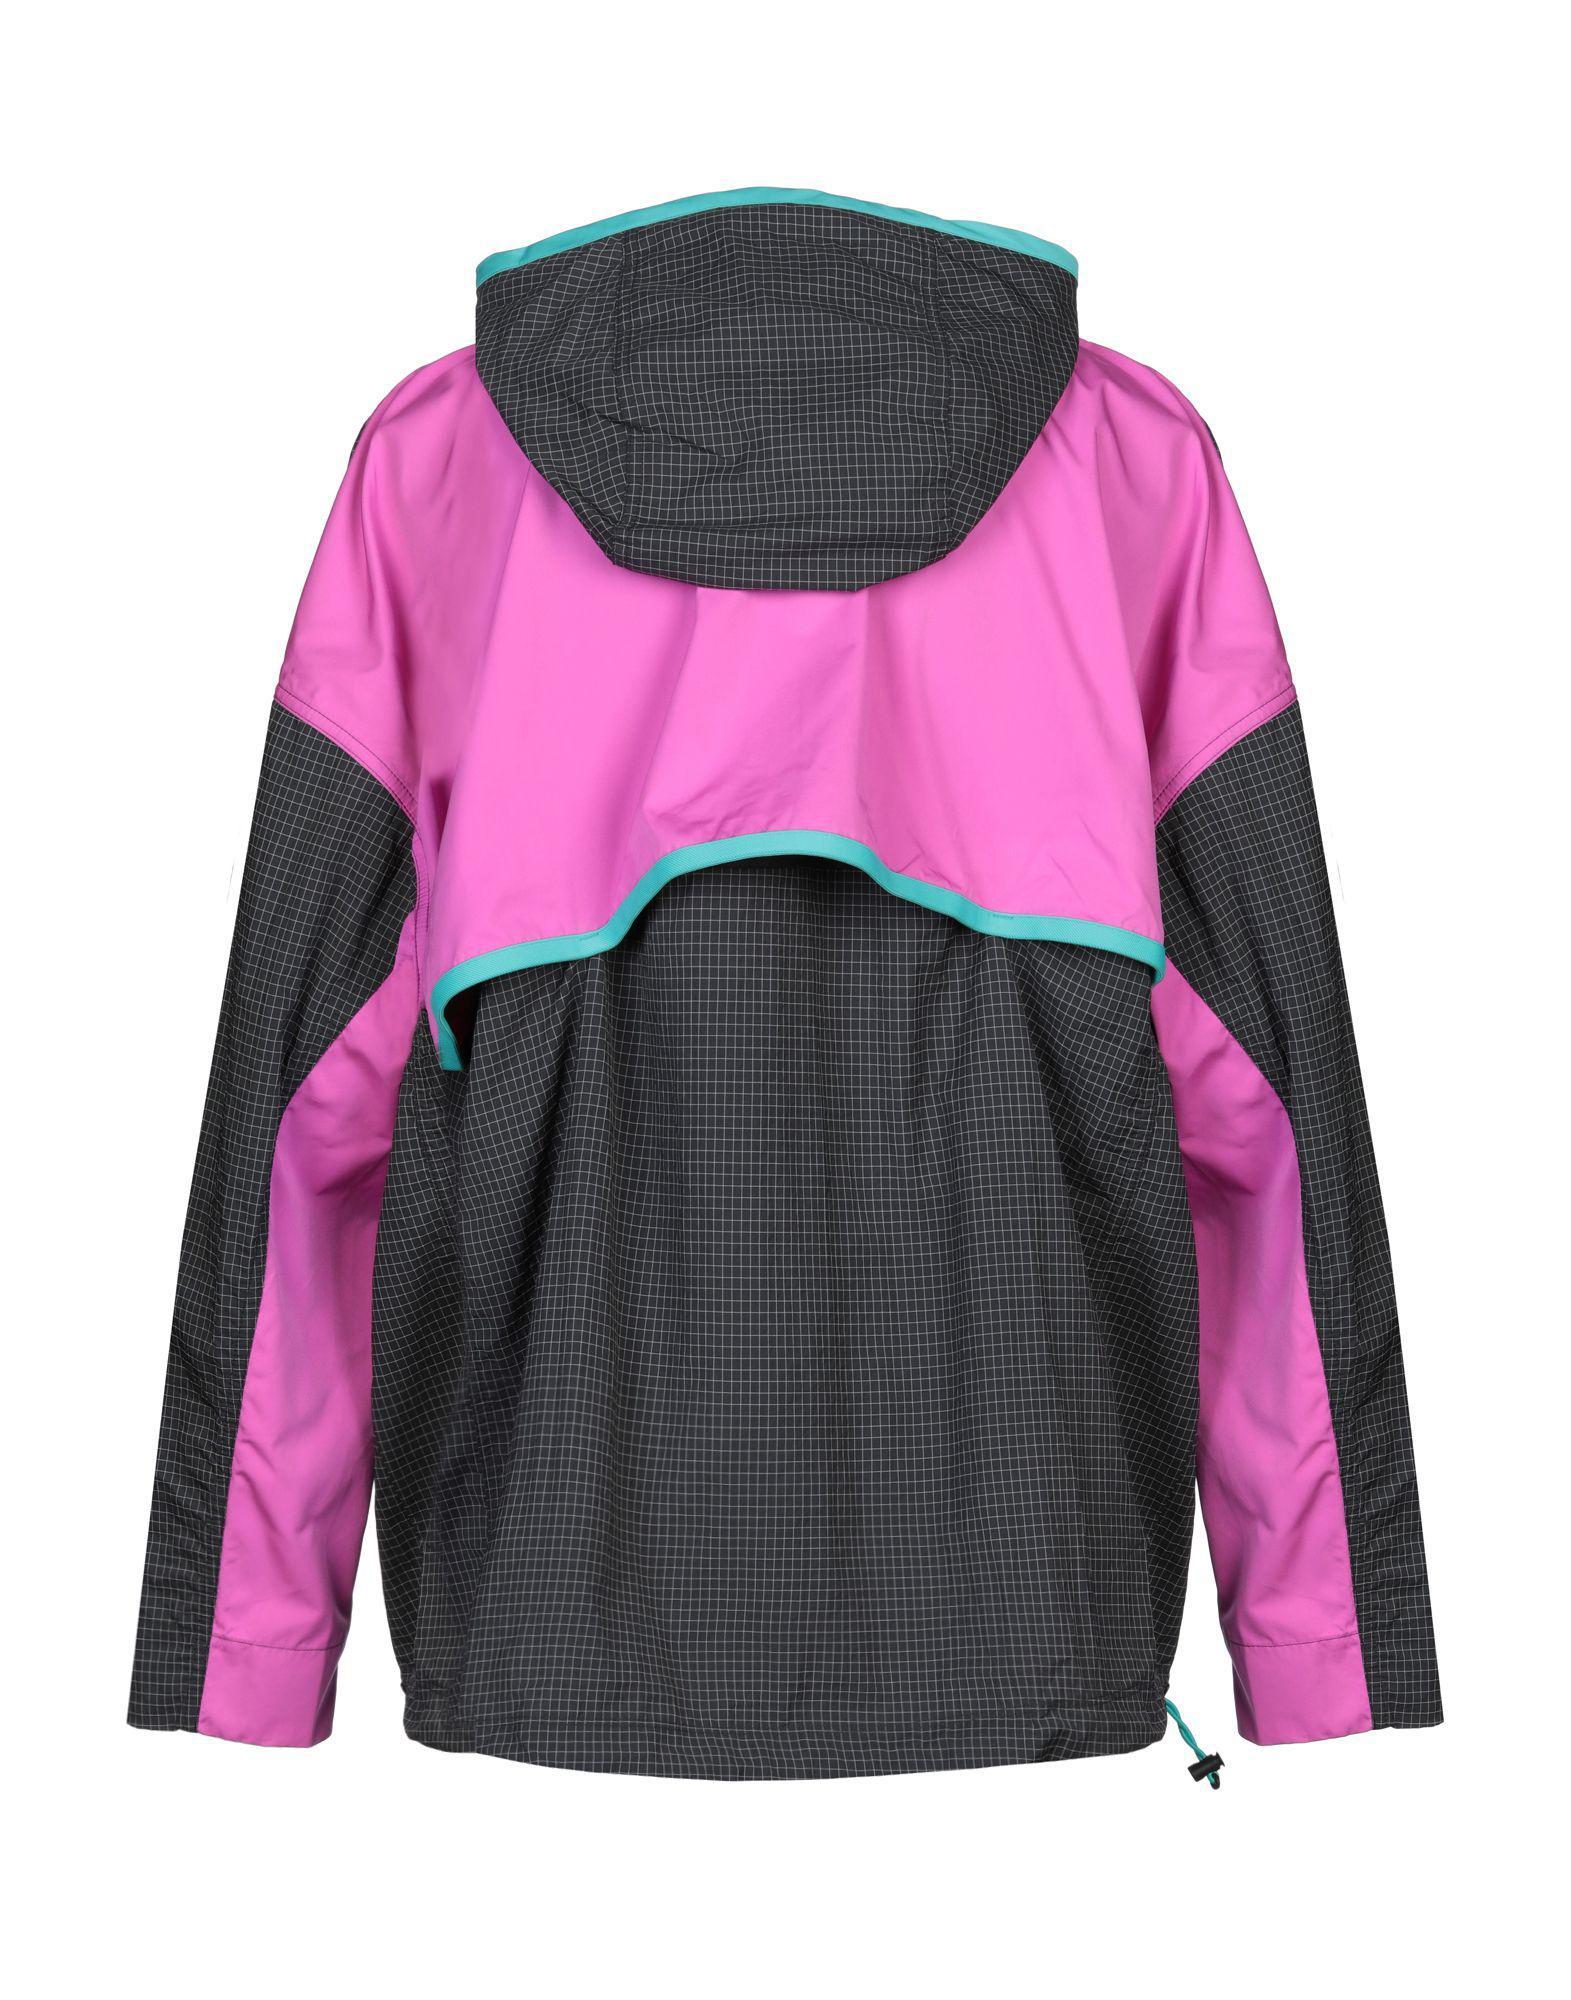 f3c63fee12e0 Lyst - Nike Jacket in Gray for Men